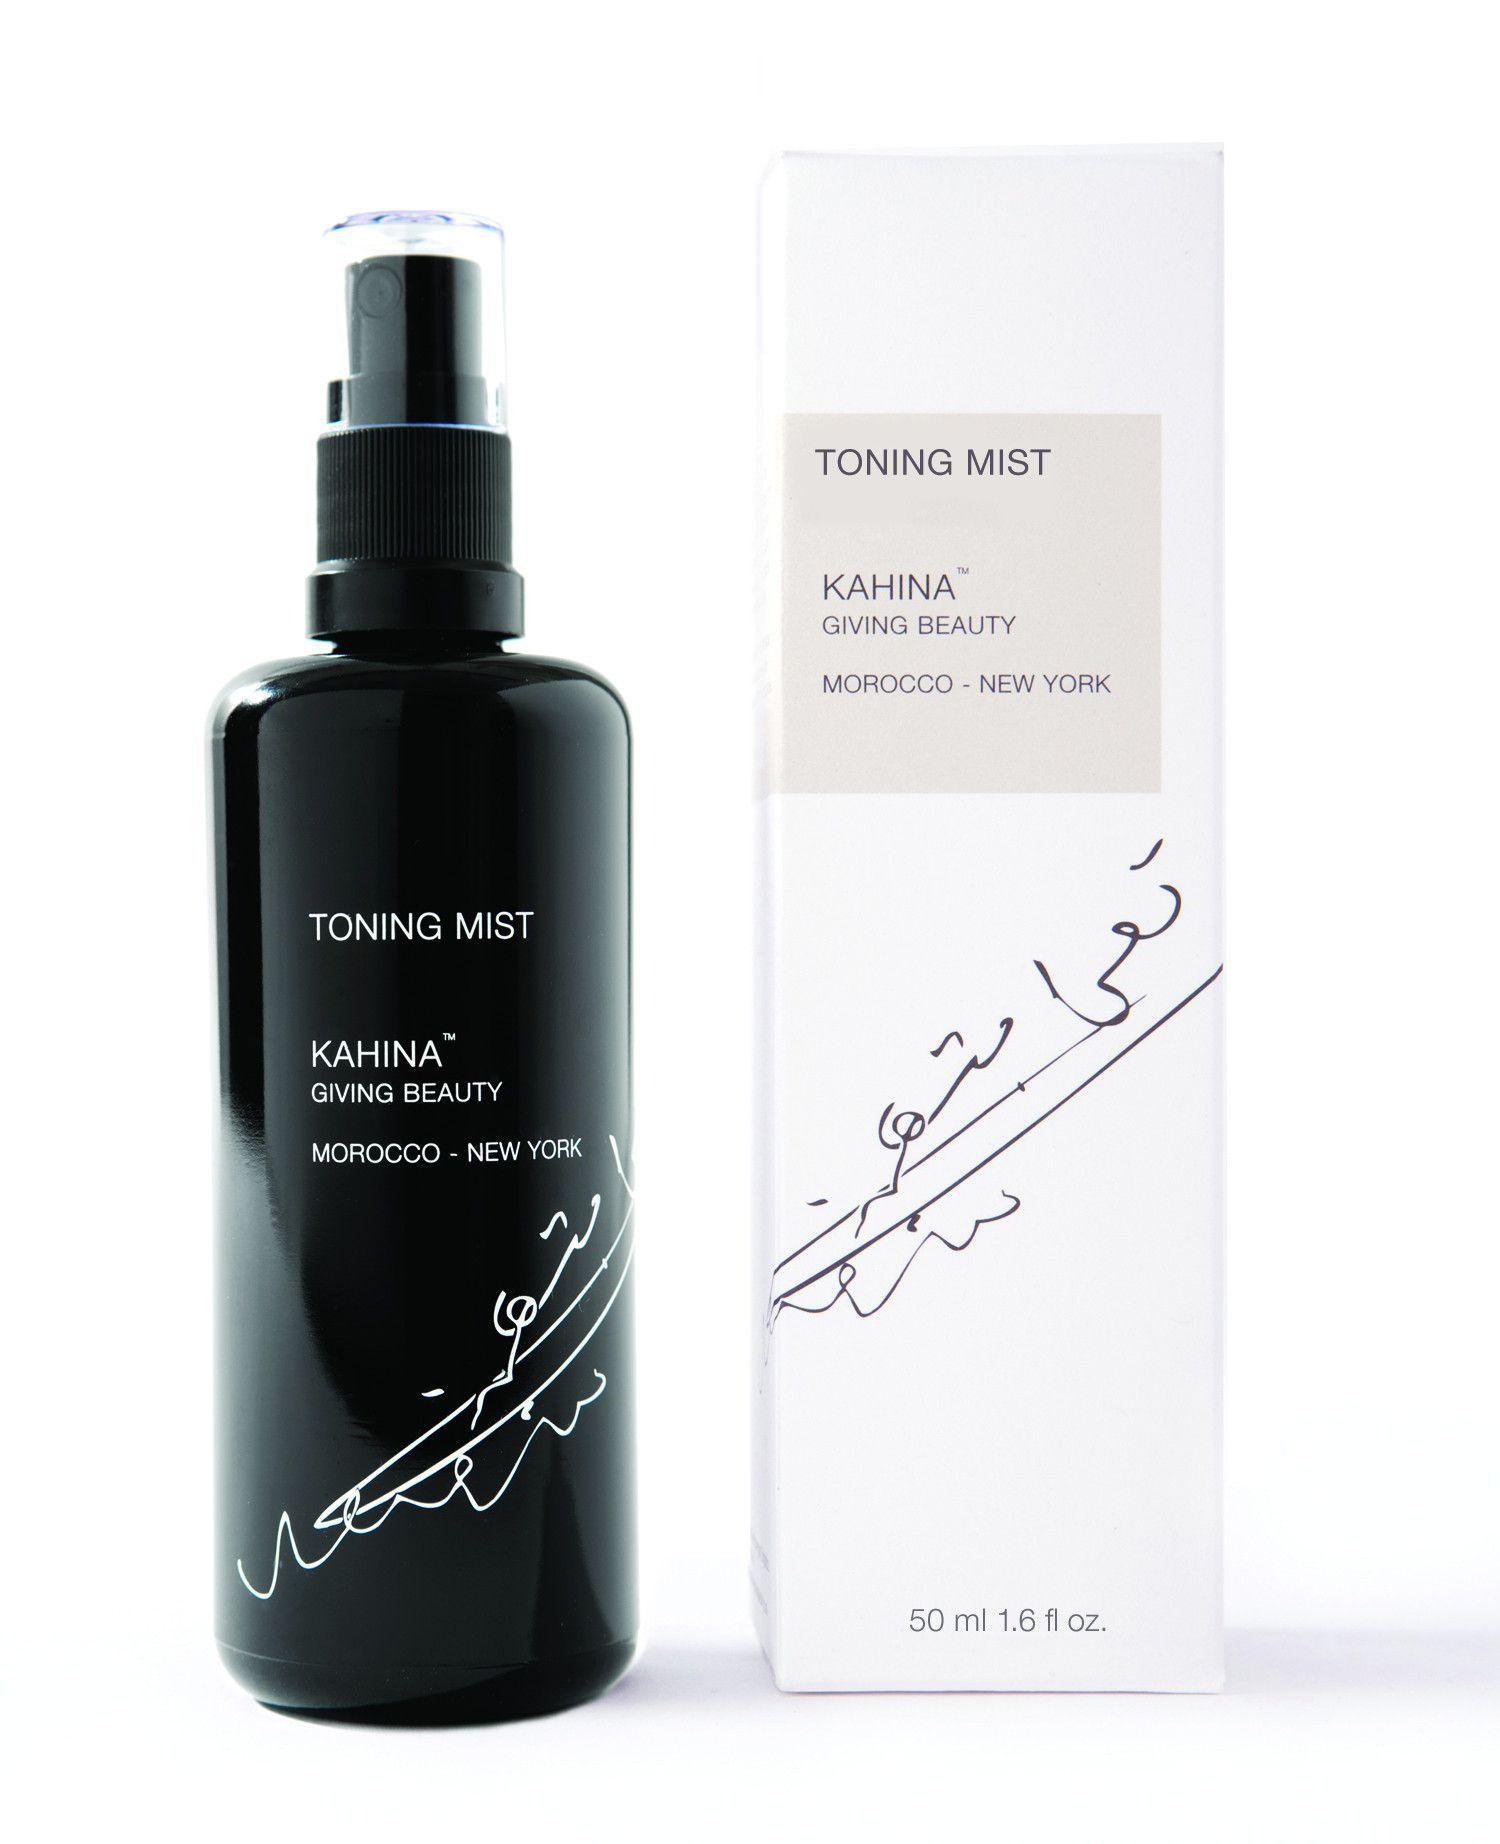 Toning Mist Hip Products Pinterest Sandalwood Hydrosol 50 Ml